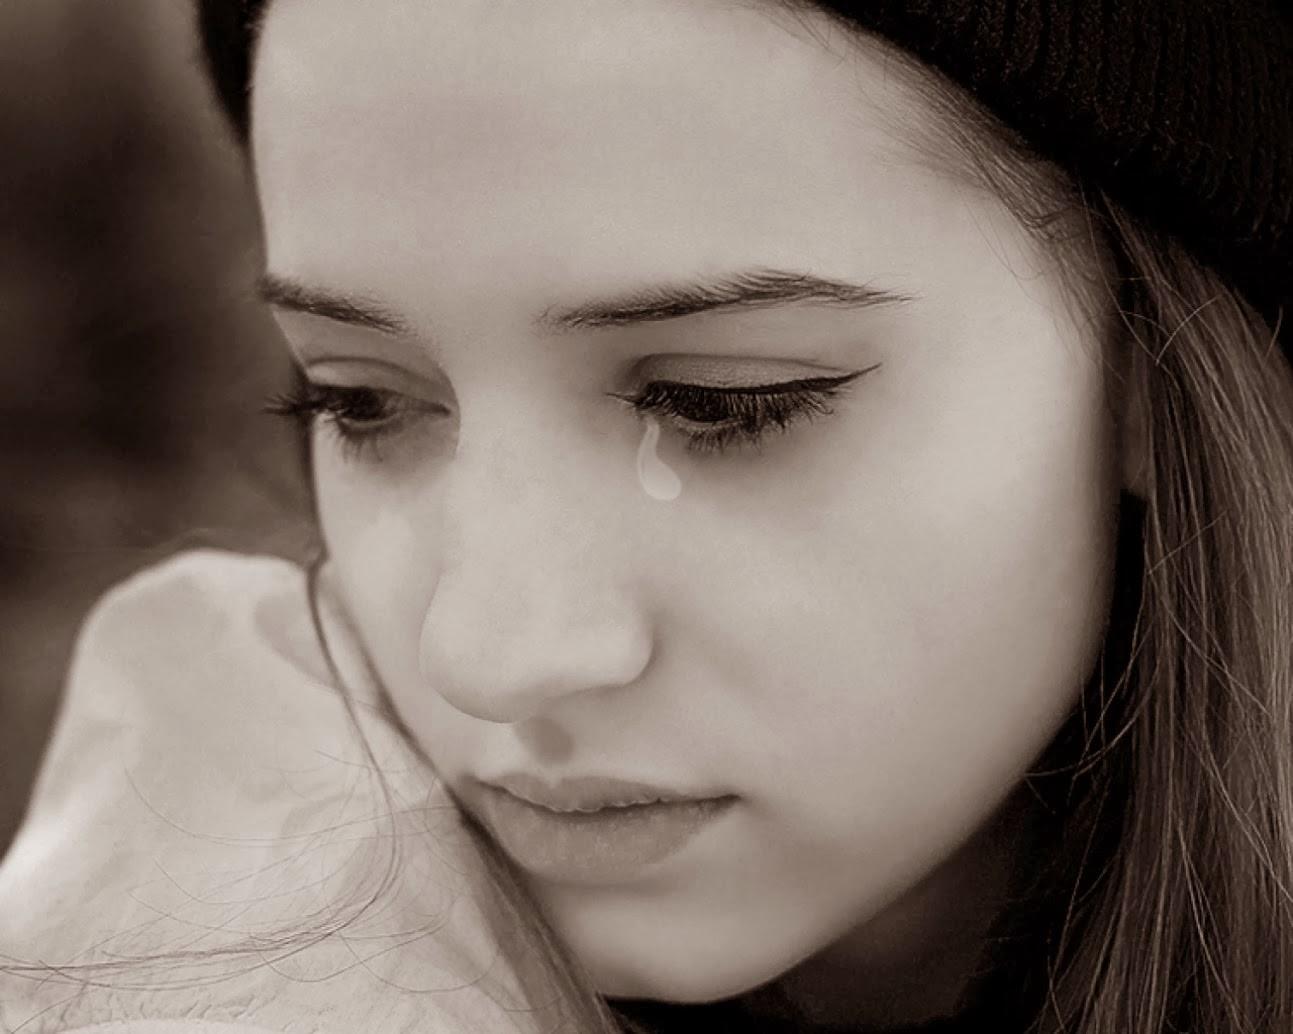 صورة صور بنات حزينه , بنات حزينه ومكتئبه